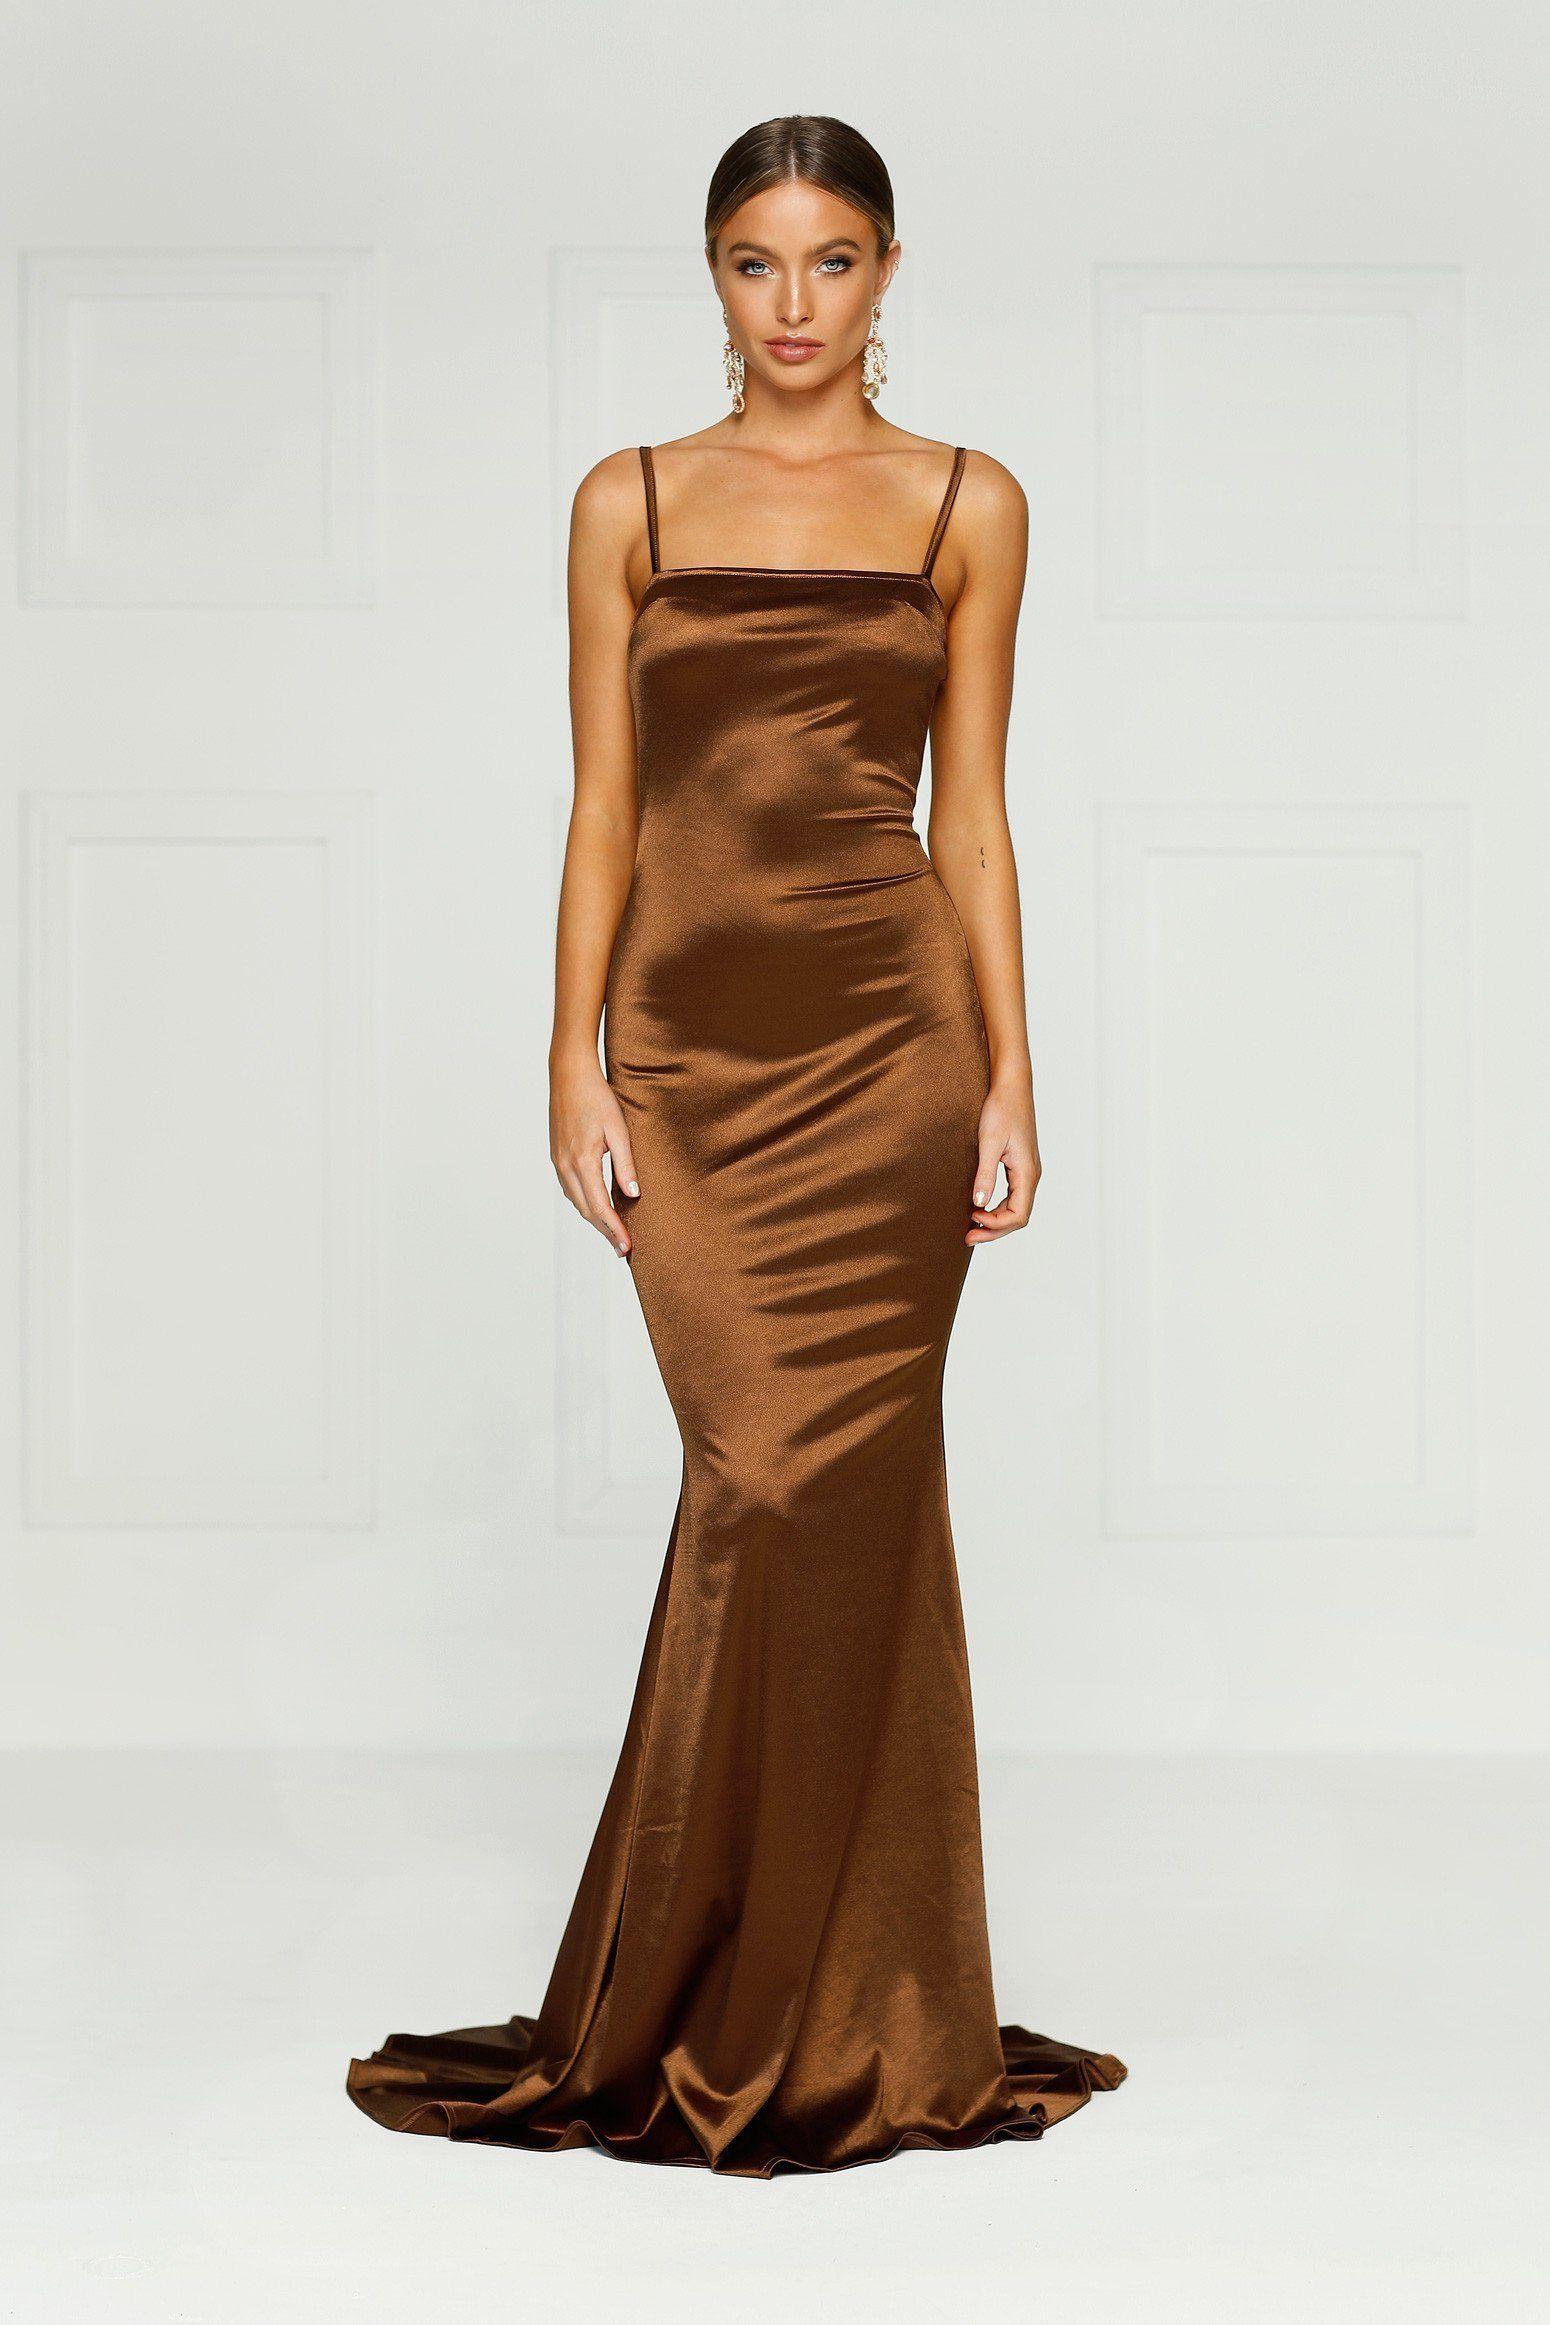 5c942ff8c03 Sexy satin stretch slip dress